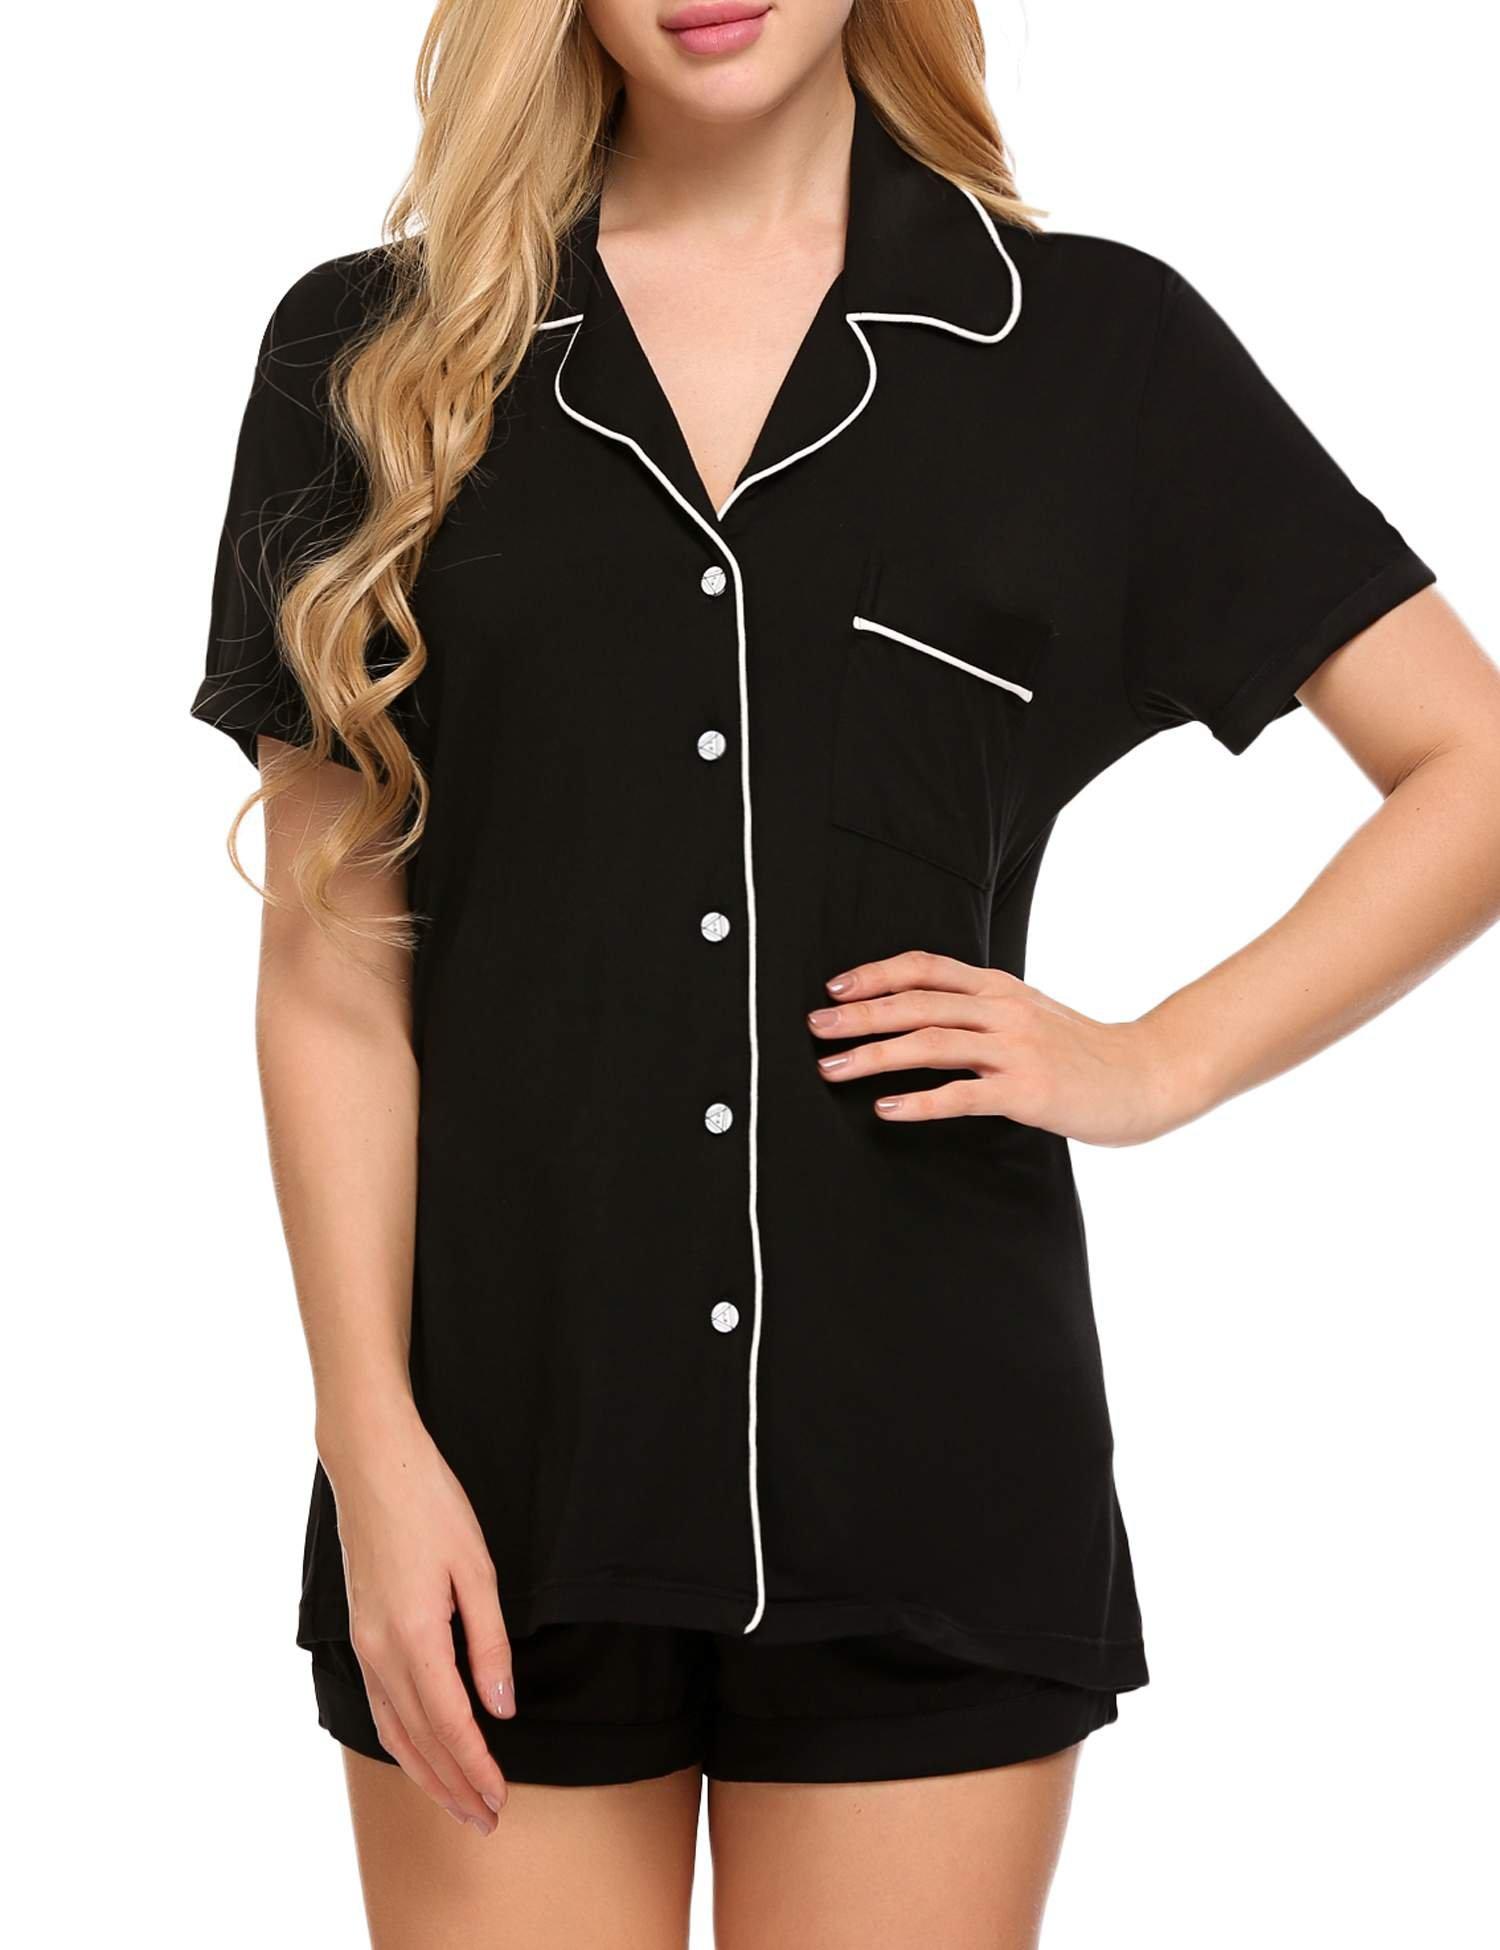 Ekouaer Slip Pajama Set Womens Short Sleepping Wear Set(Black, Medium) by Ekouaer